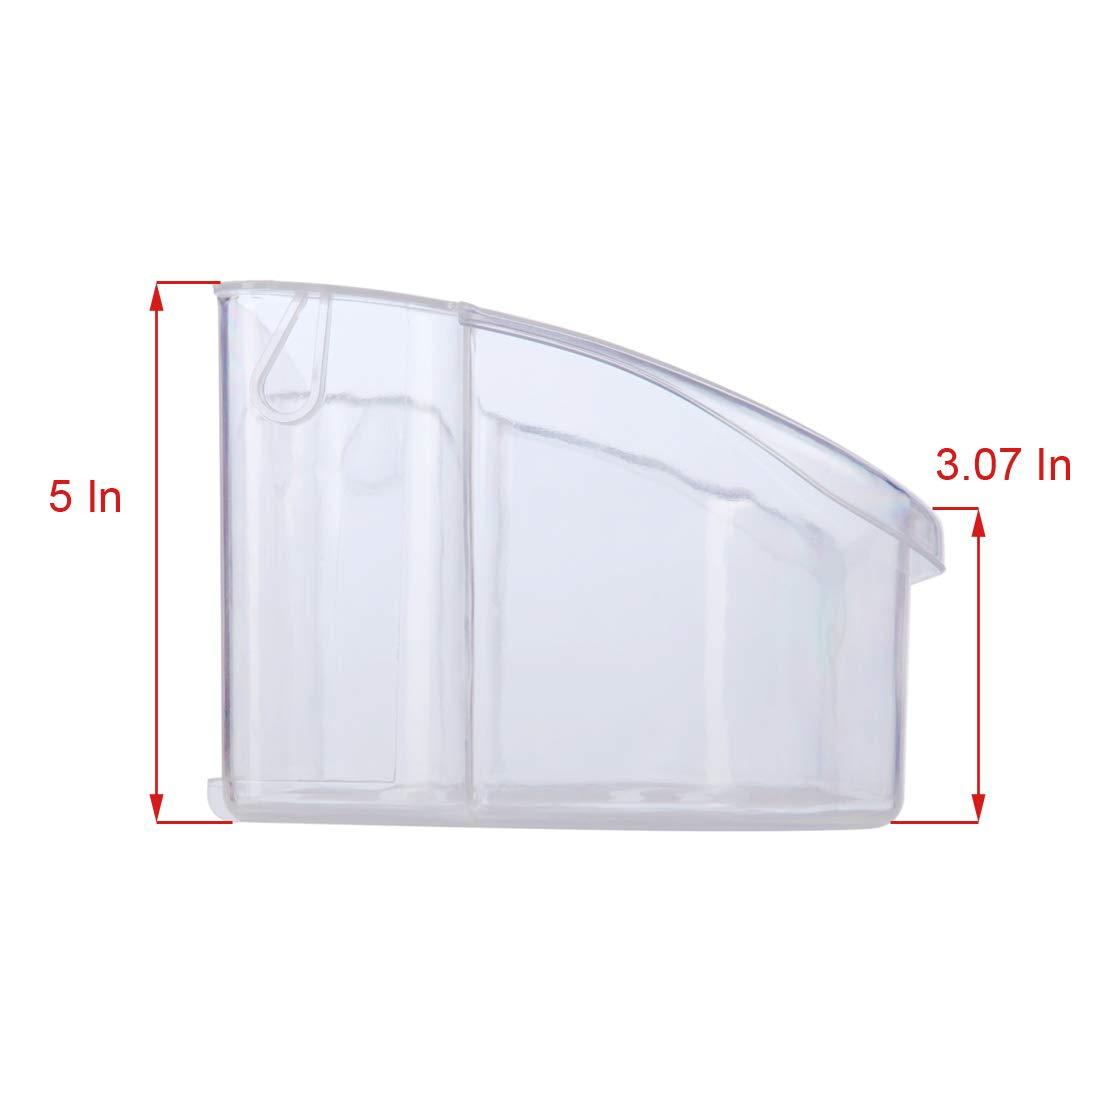 240356402 Frigidaire Door Shelf Bin Unit Compatible with frigidaire Kenmore,electrolux,Upper Slot Replacement Shelf,Replaces ffss2315td0,lfus2613leo,240430312,240356416,240356407,AP2549958